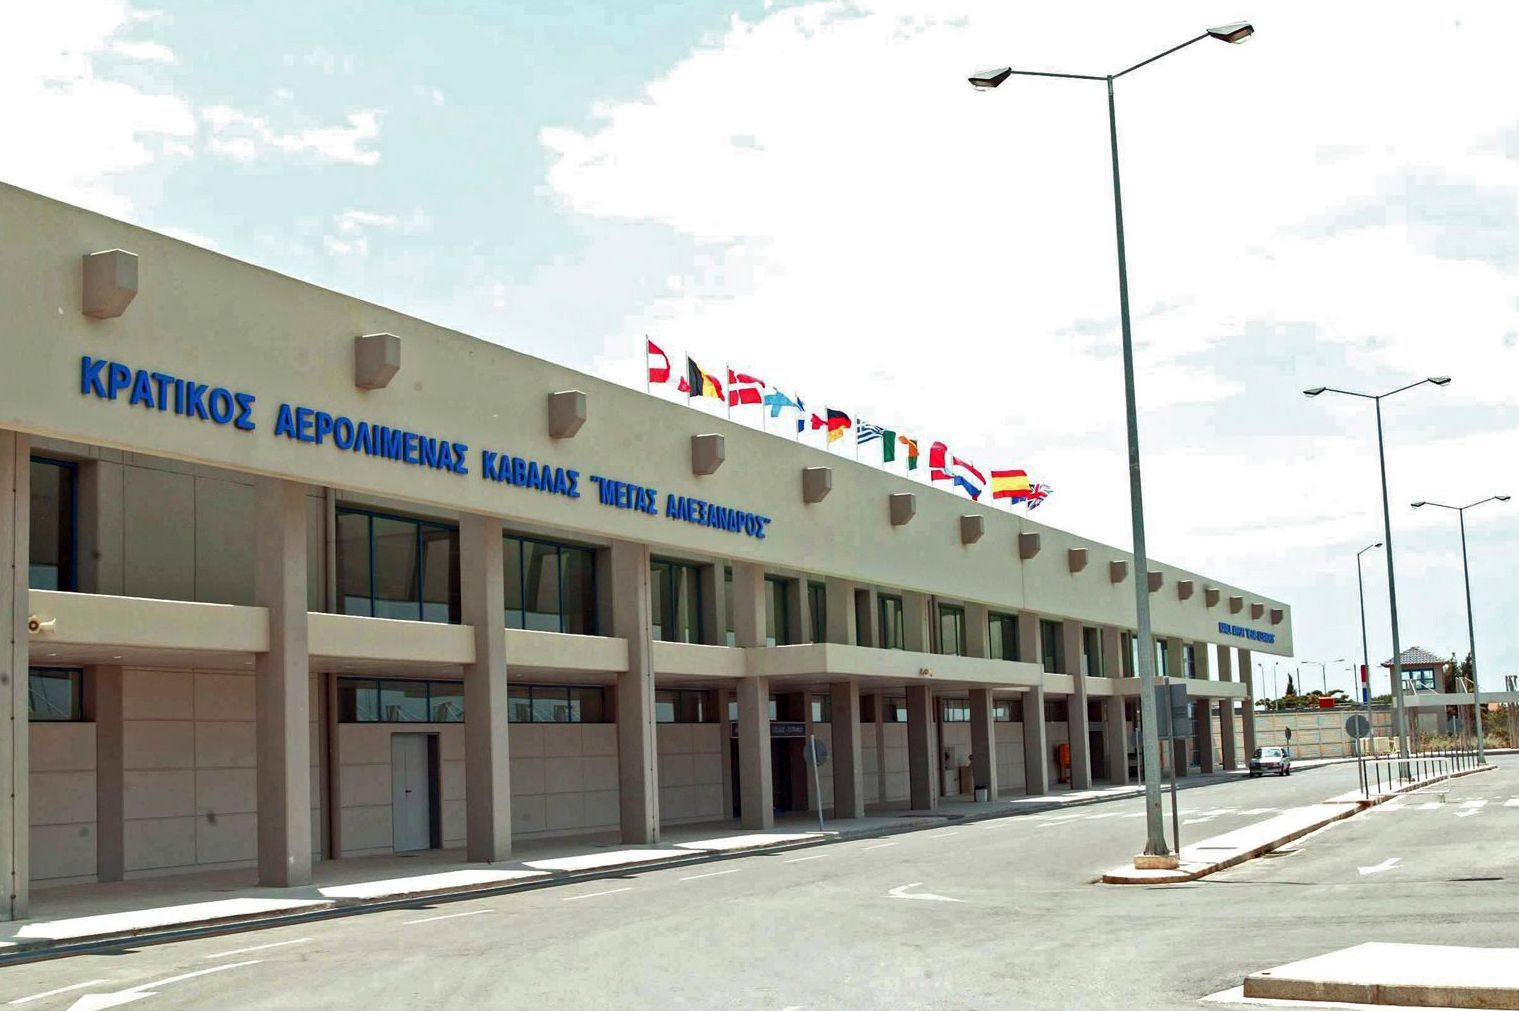 Griechenland Flughafen Kavala airport